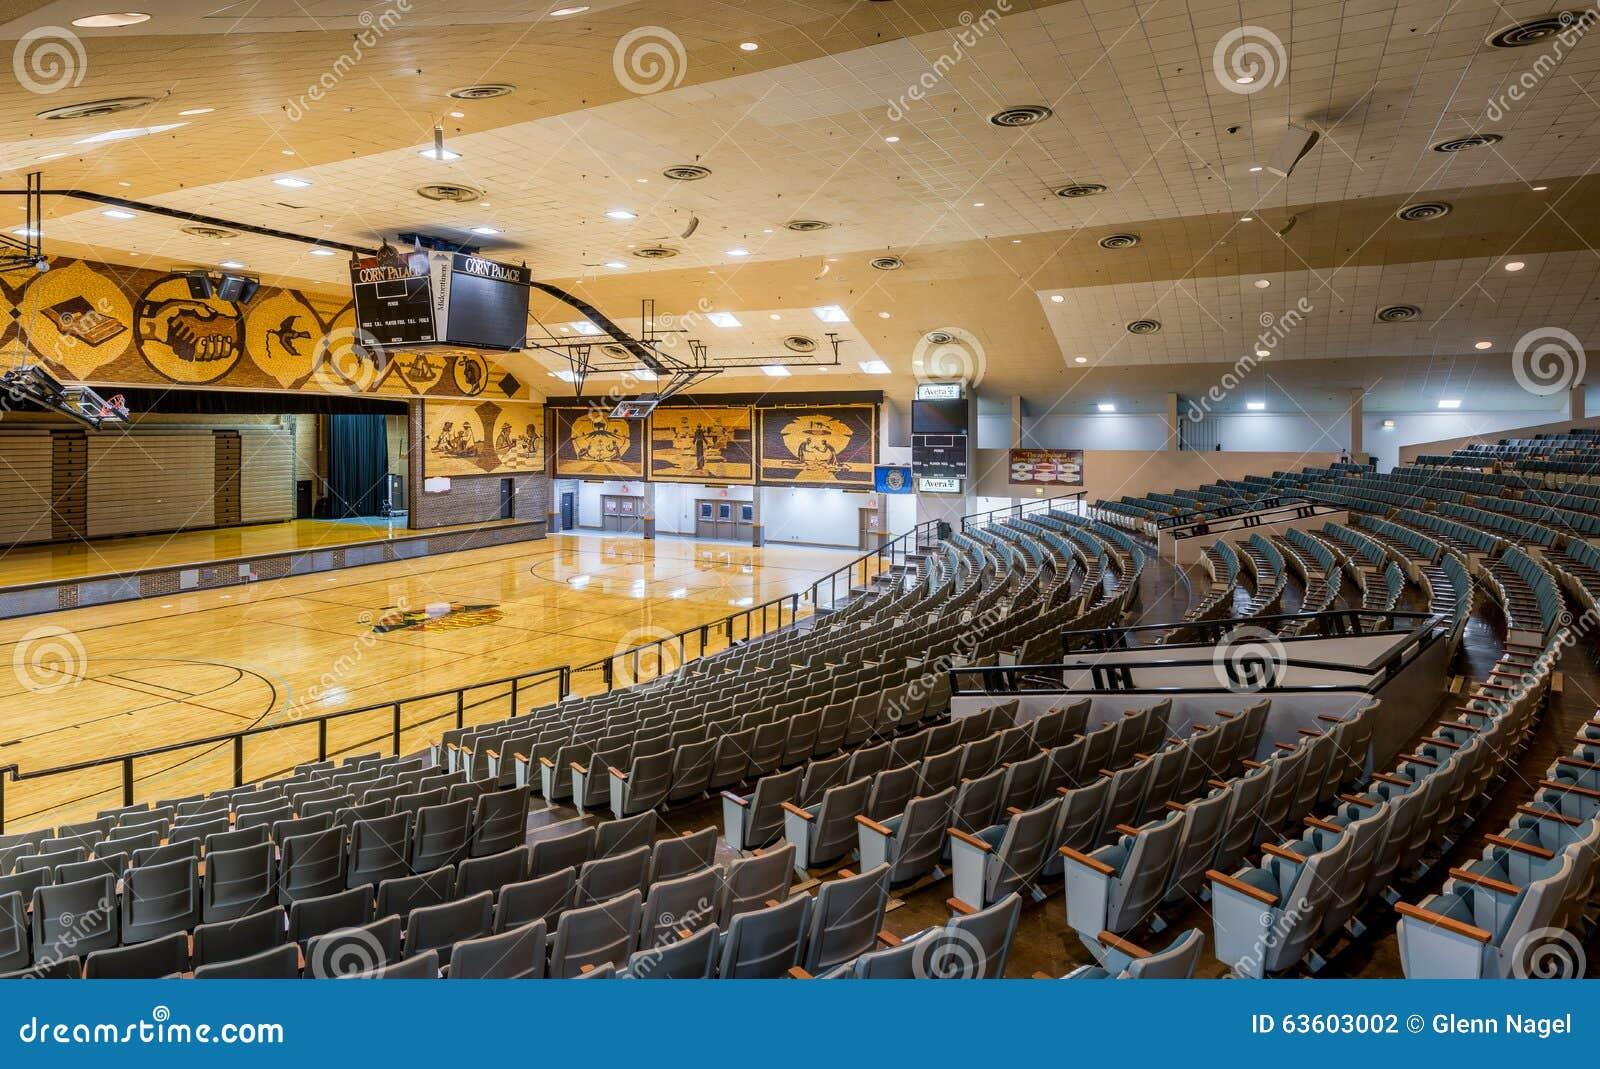 Corn Palace Interior Editorial Photography Image Of Basketball